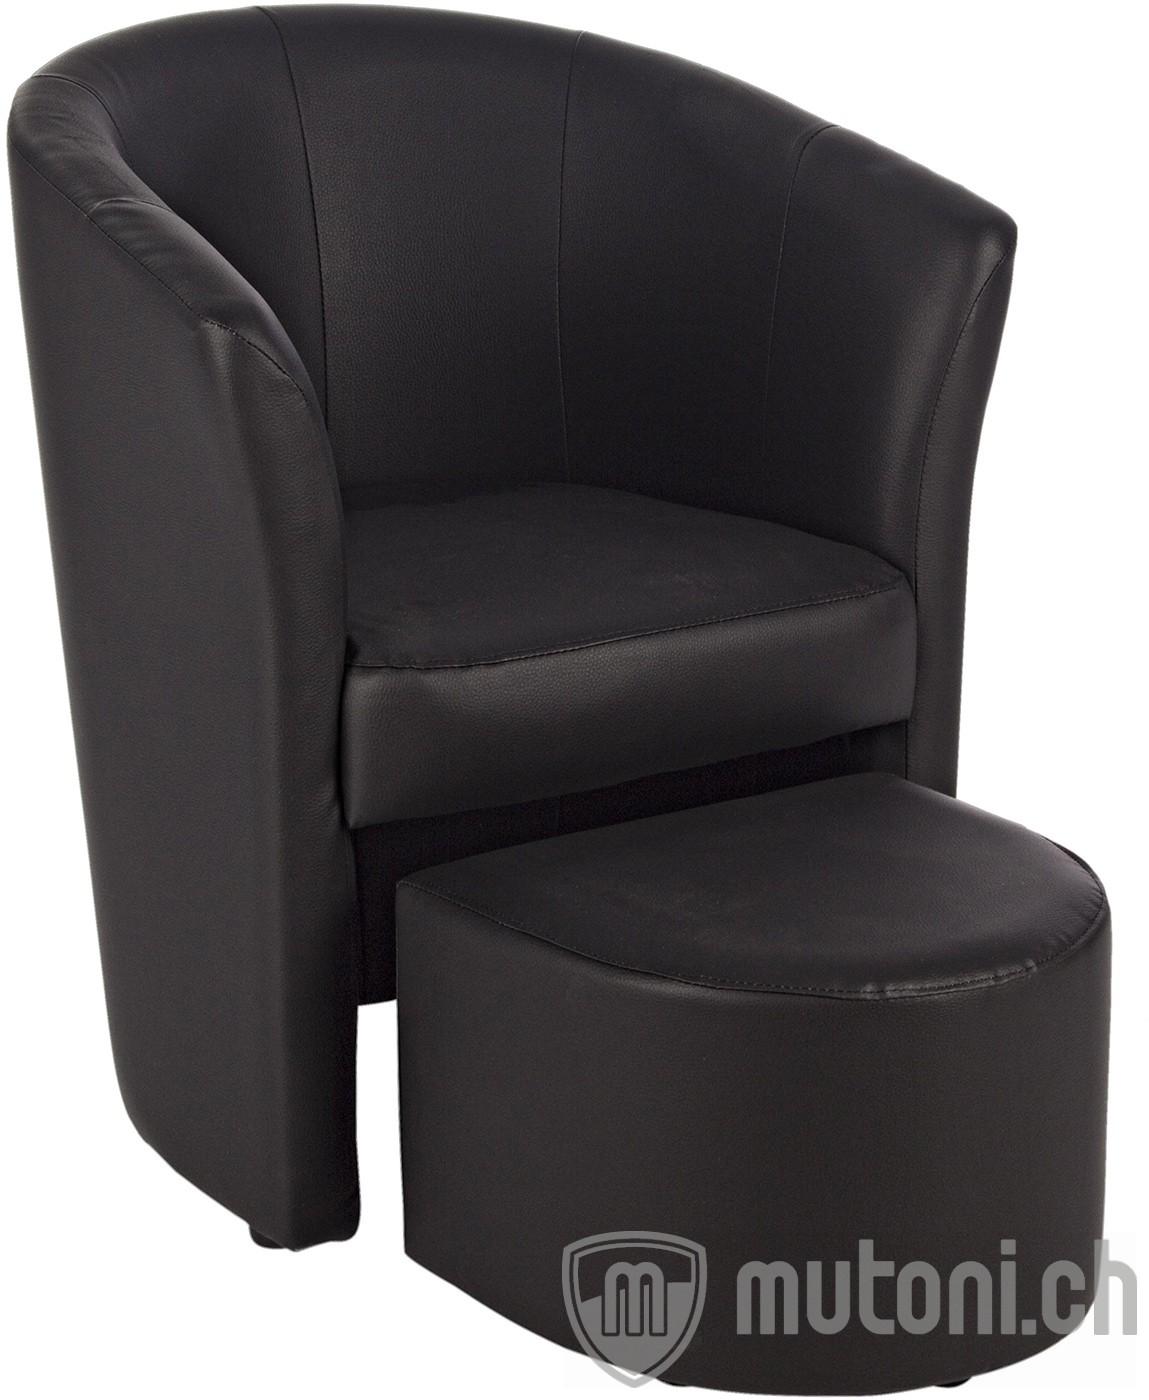 loungsessel rita mit hocker schwarz loungesessel sessel wohnzimmer m bel mutoni m bel. Black Bedroom Furniture Sets. Home Design Ideas